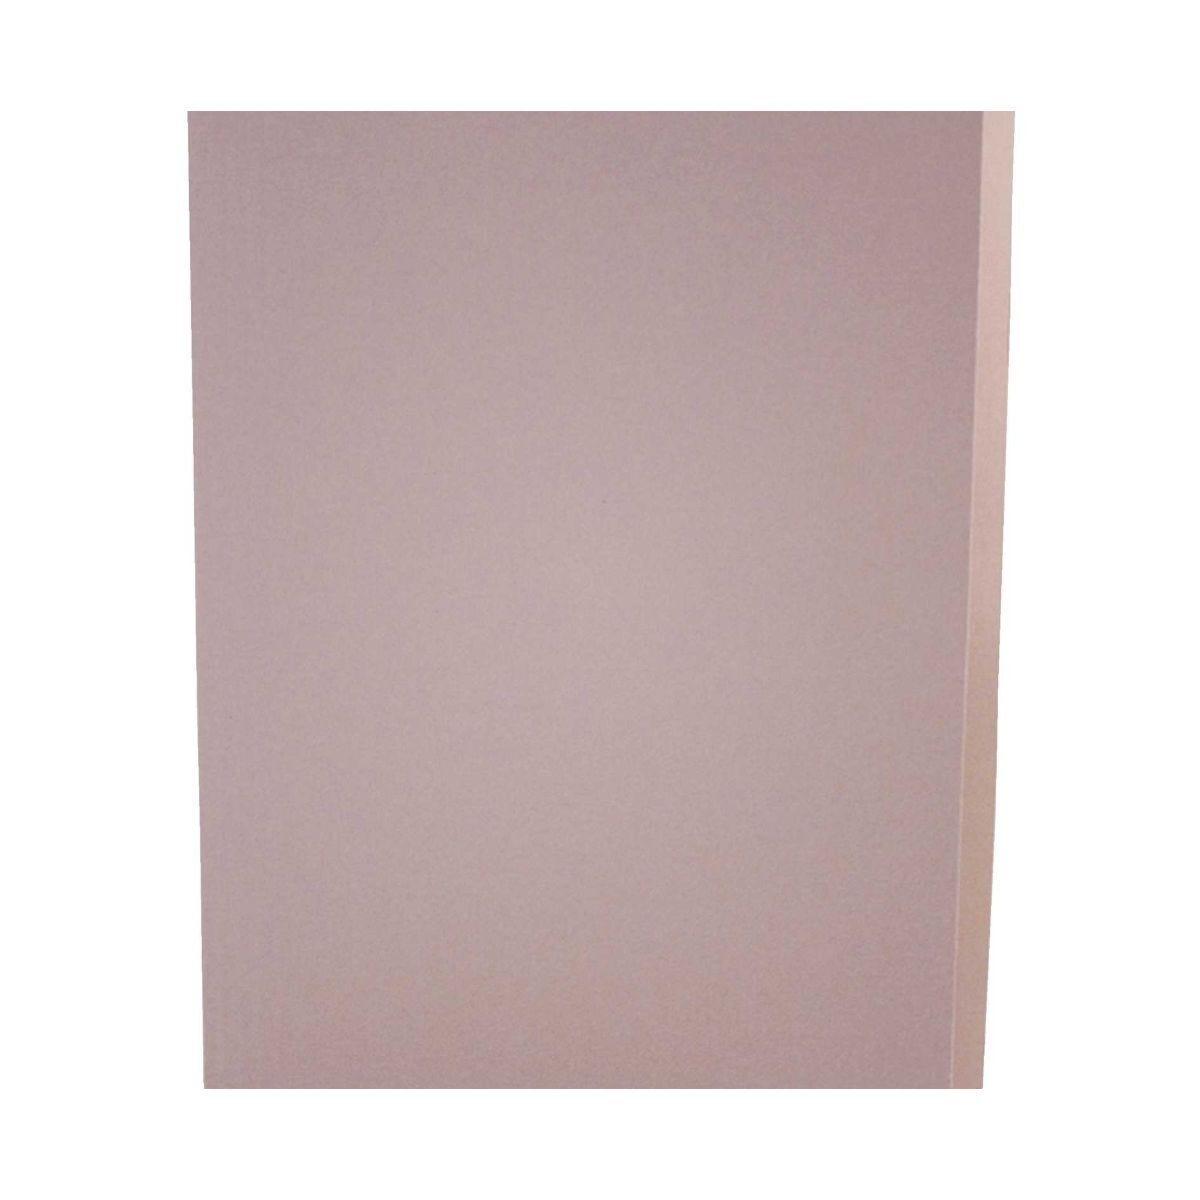 Square Cut Folders Foolscap Pack of 100 Buff